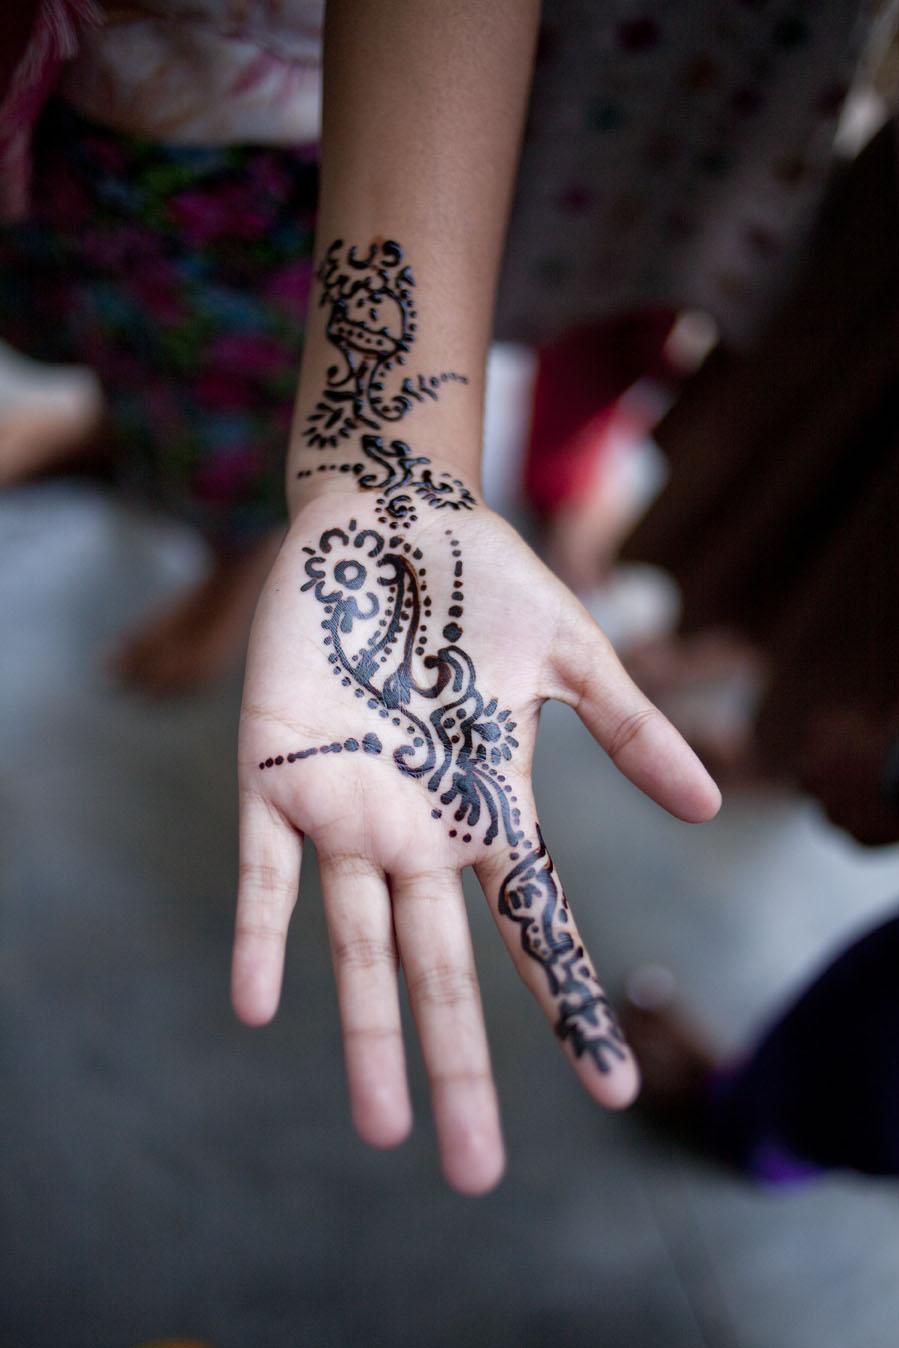 Becca_Ewing_India_teenage girl henna.jpg